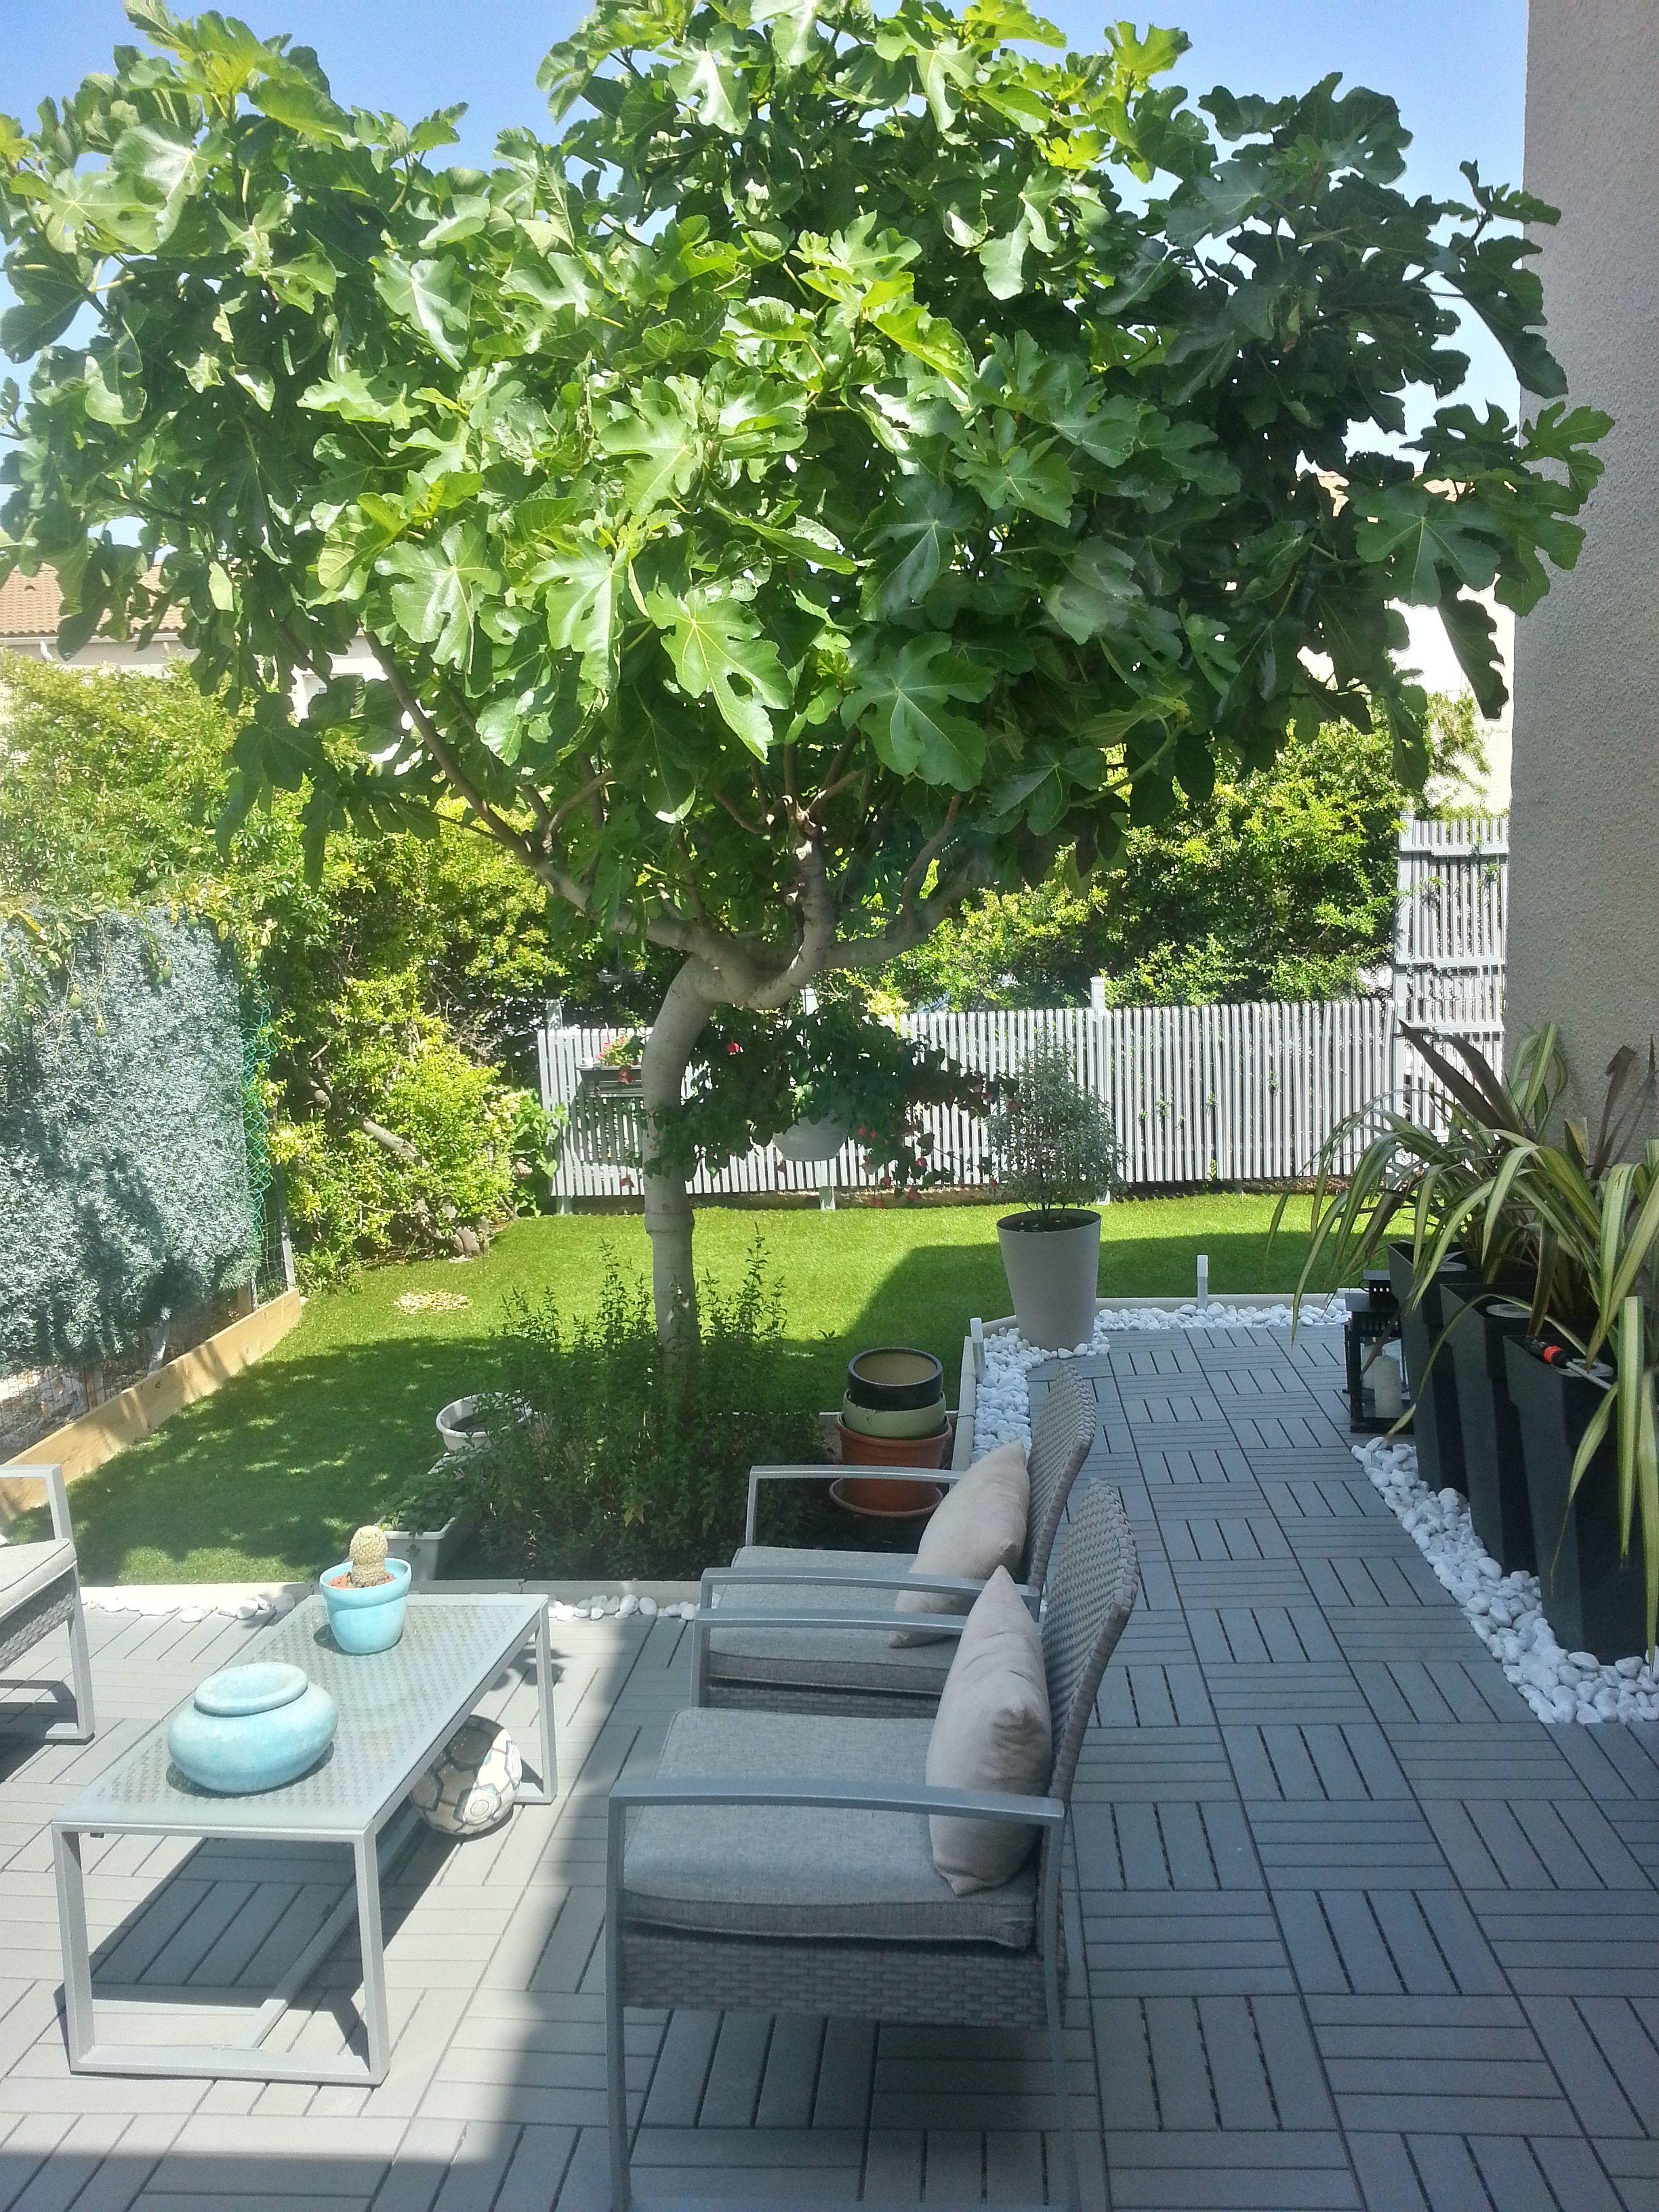 modern garden front yard mlle c bo garden terrasse ikea - Garden Ideas Ikea